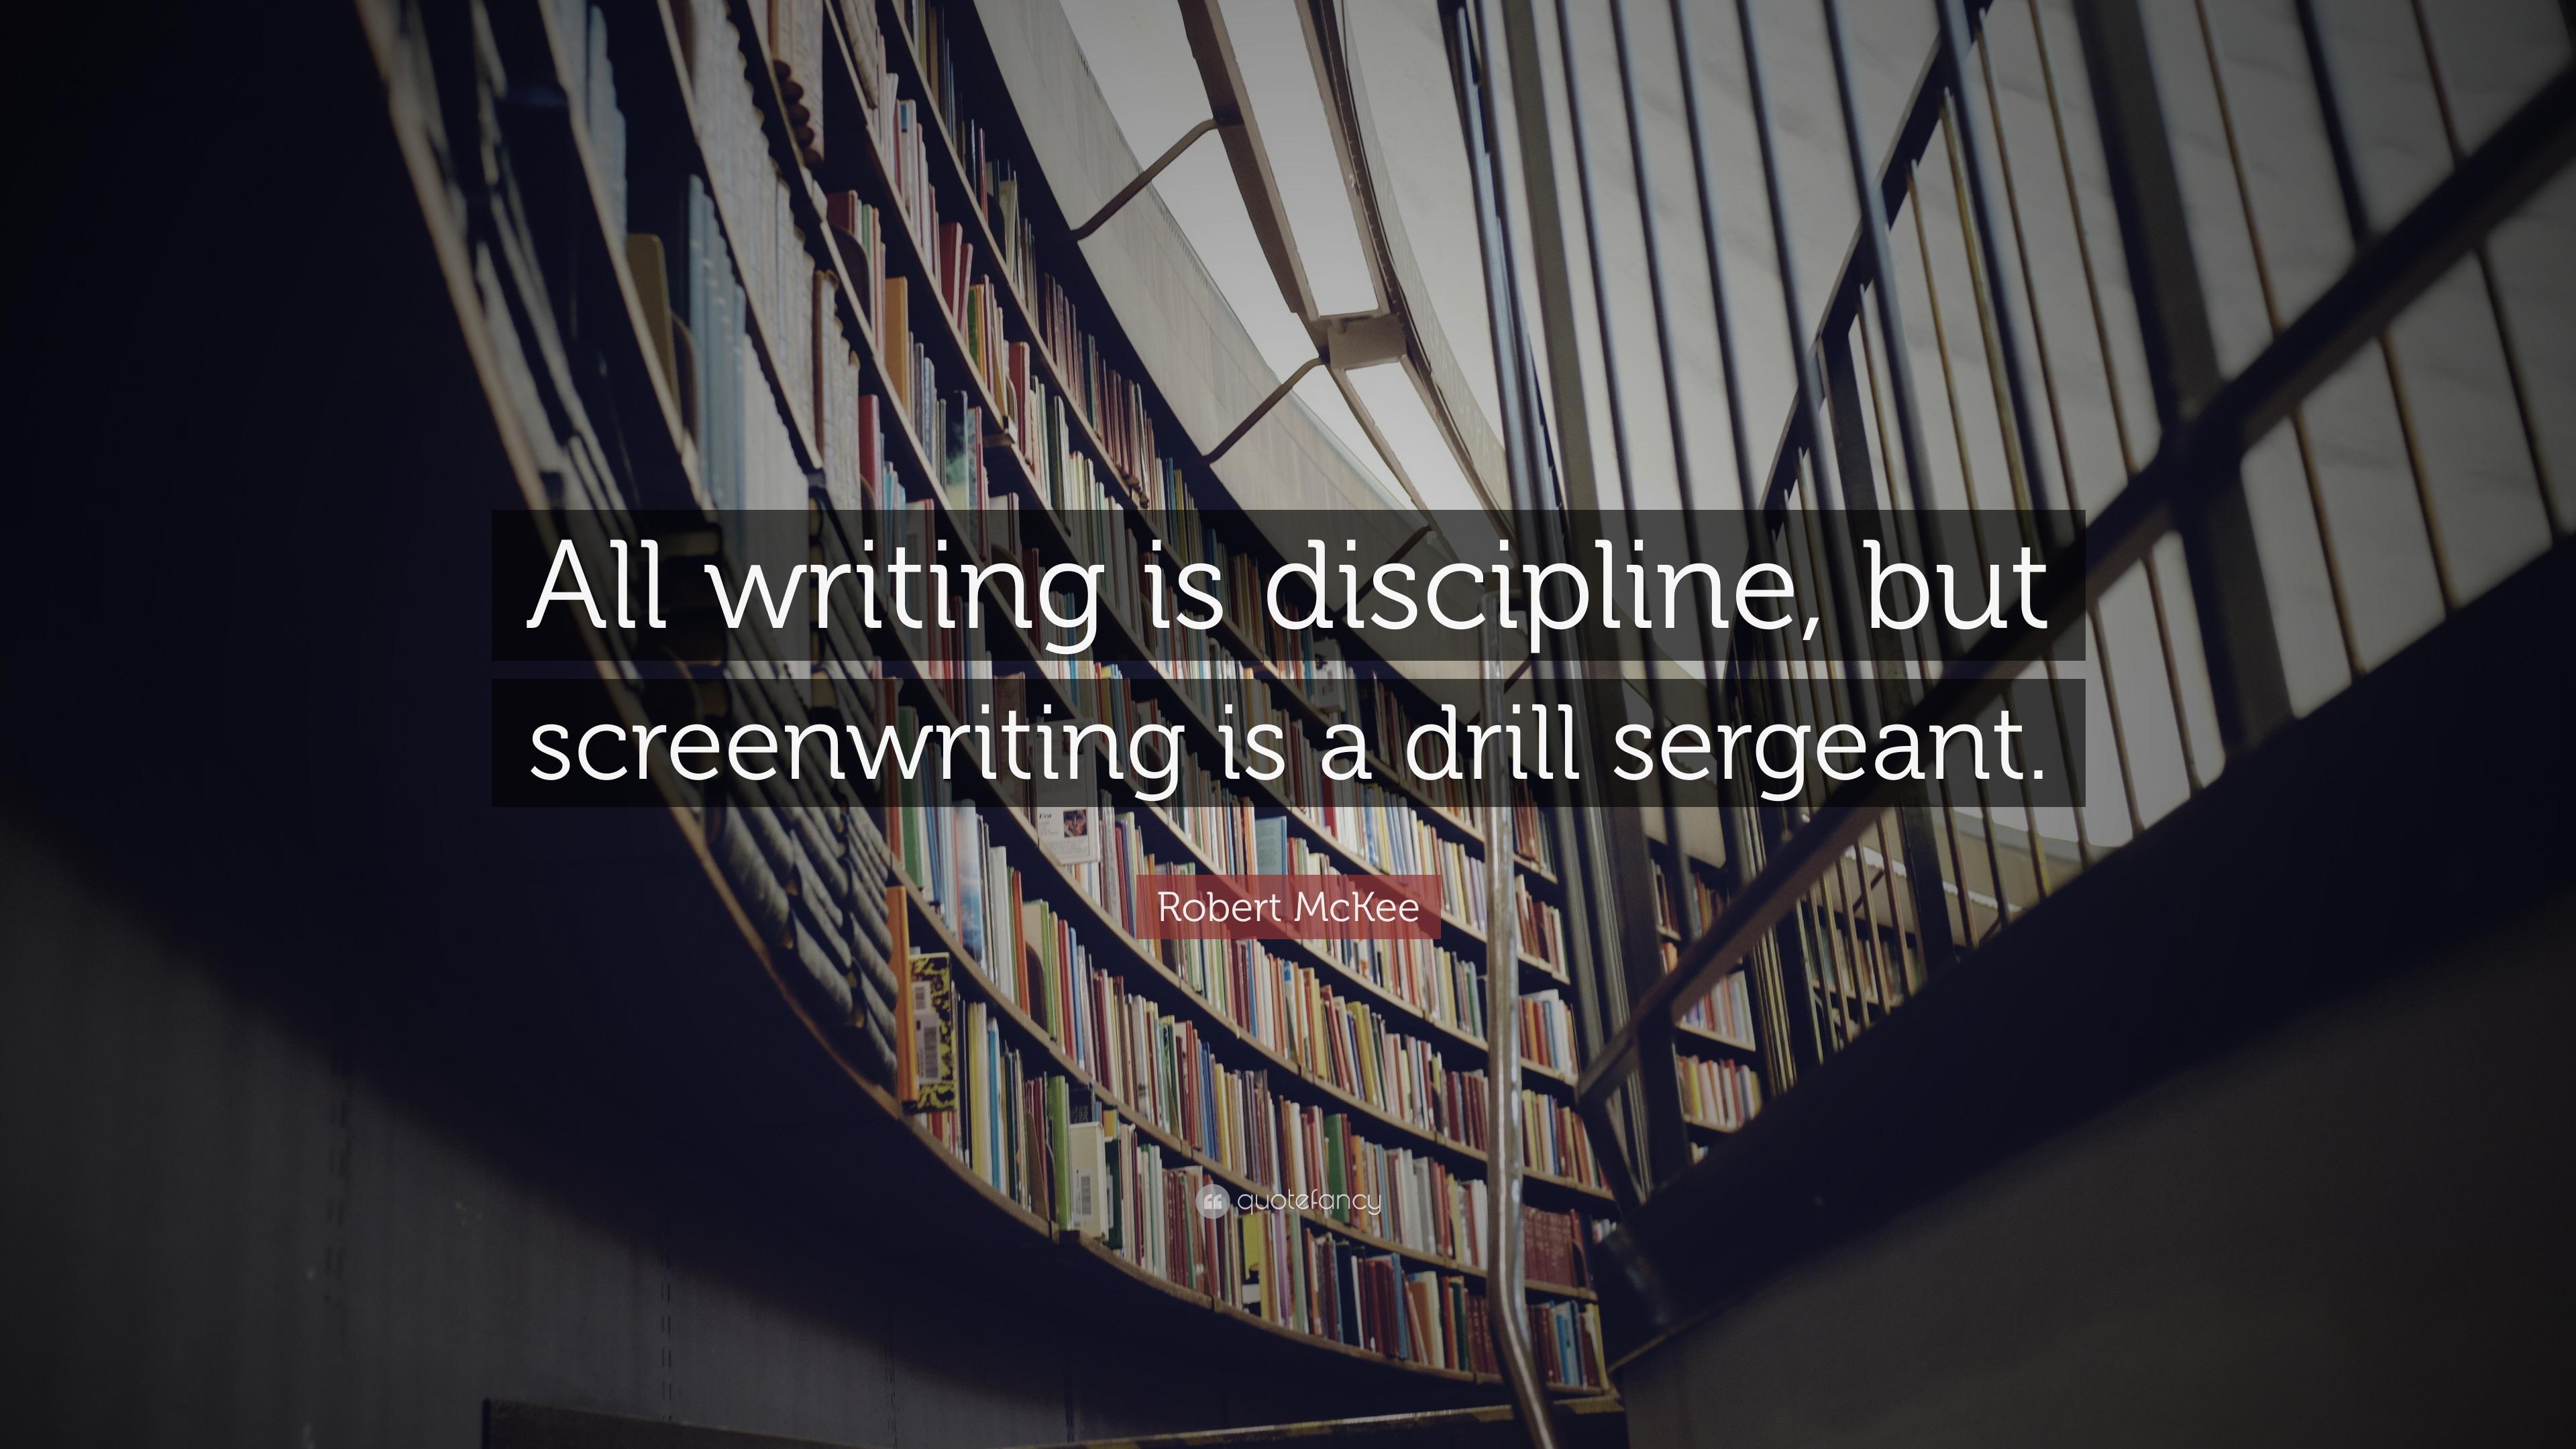 Wallpaper desk Writer screenwriter 1287x891 QE 3840x2160